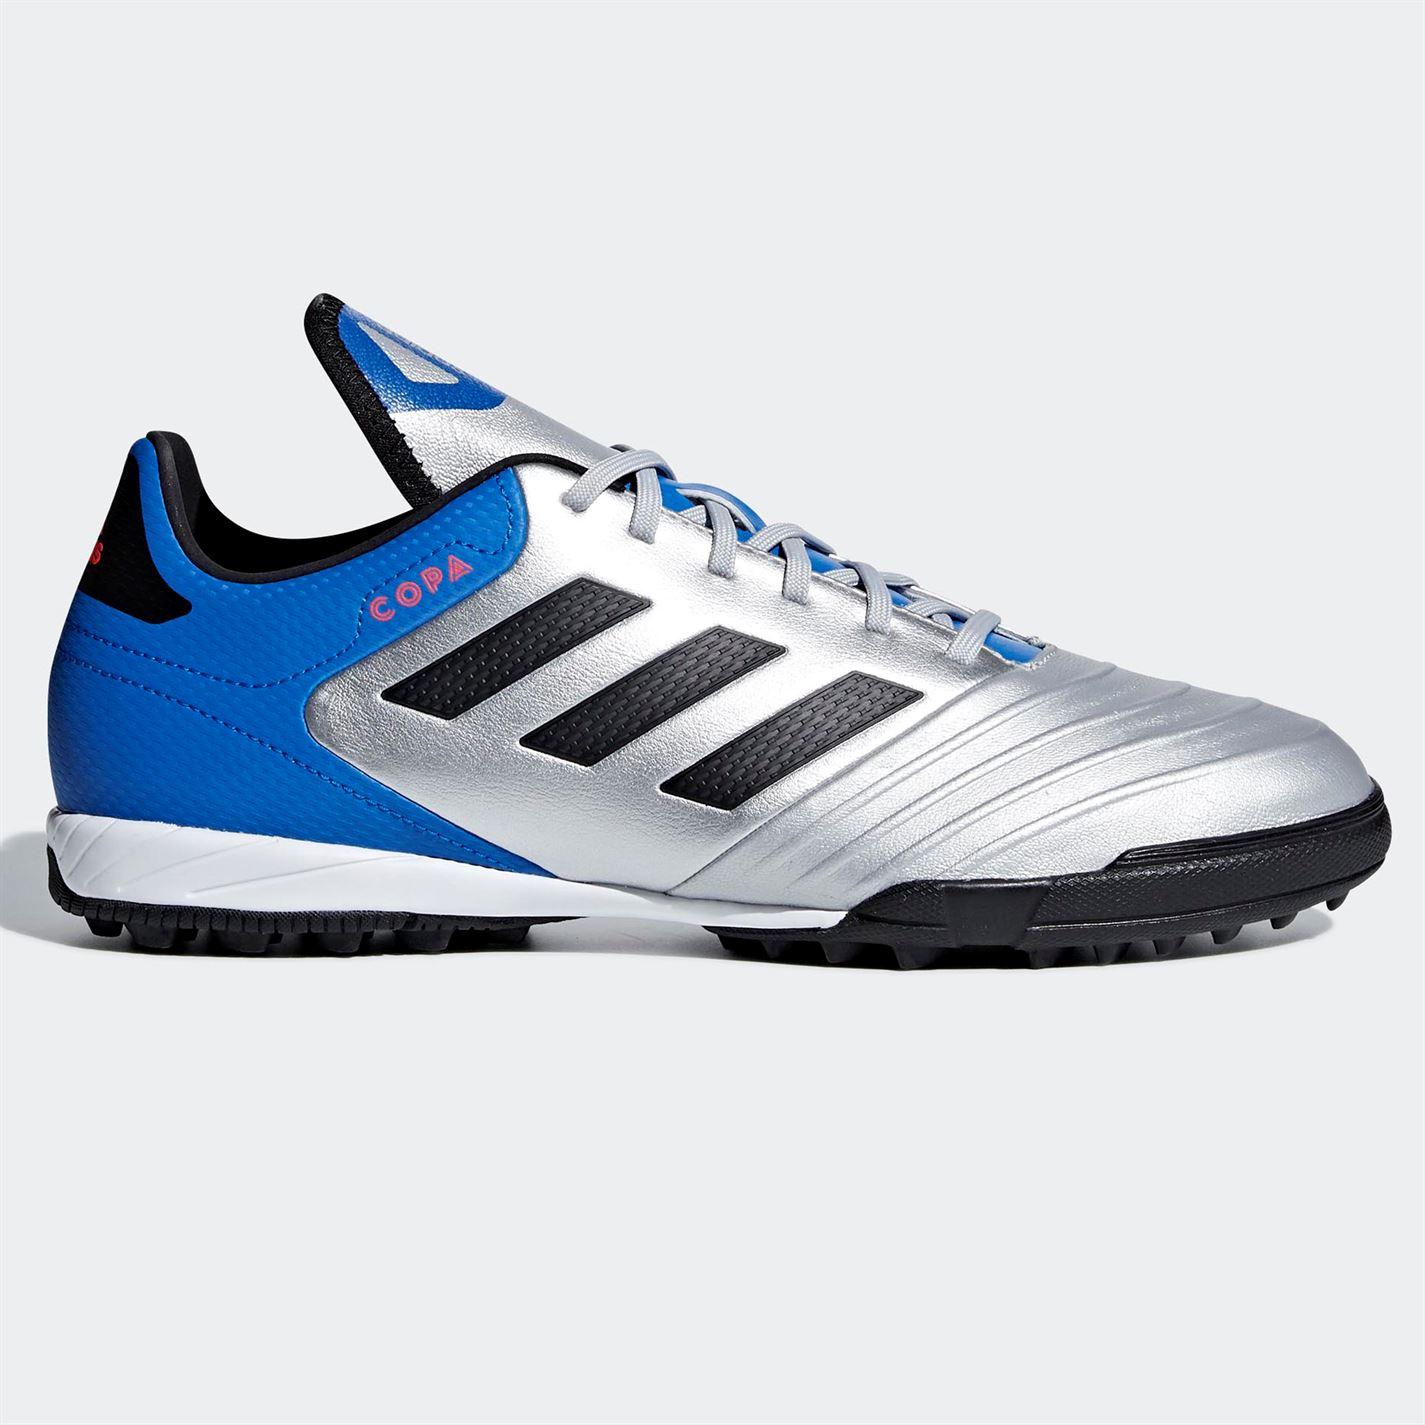 Adidas Copa Tango 18.3 Mens Astro Turf Trainers